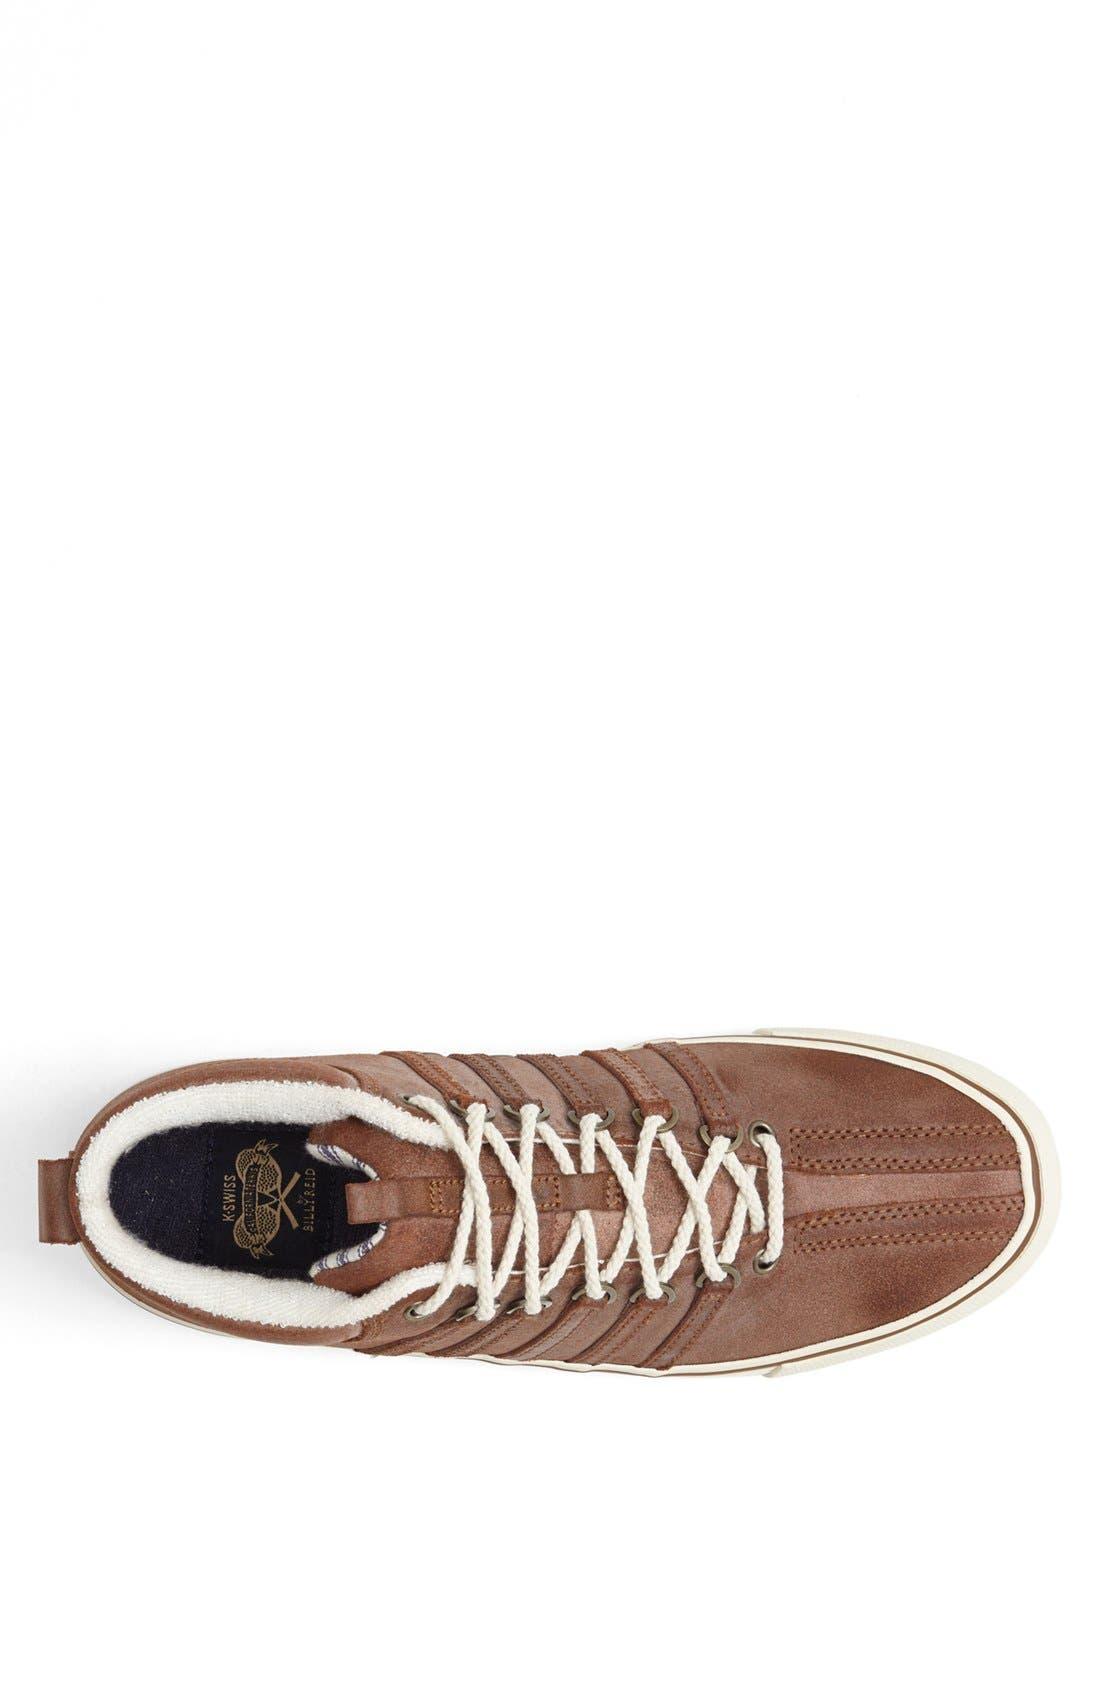 Alternate Image 3  - K-Swiss 'Billy Reid Venice' Chukka Sneaker (Men)